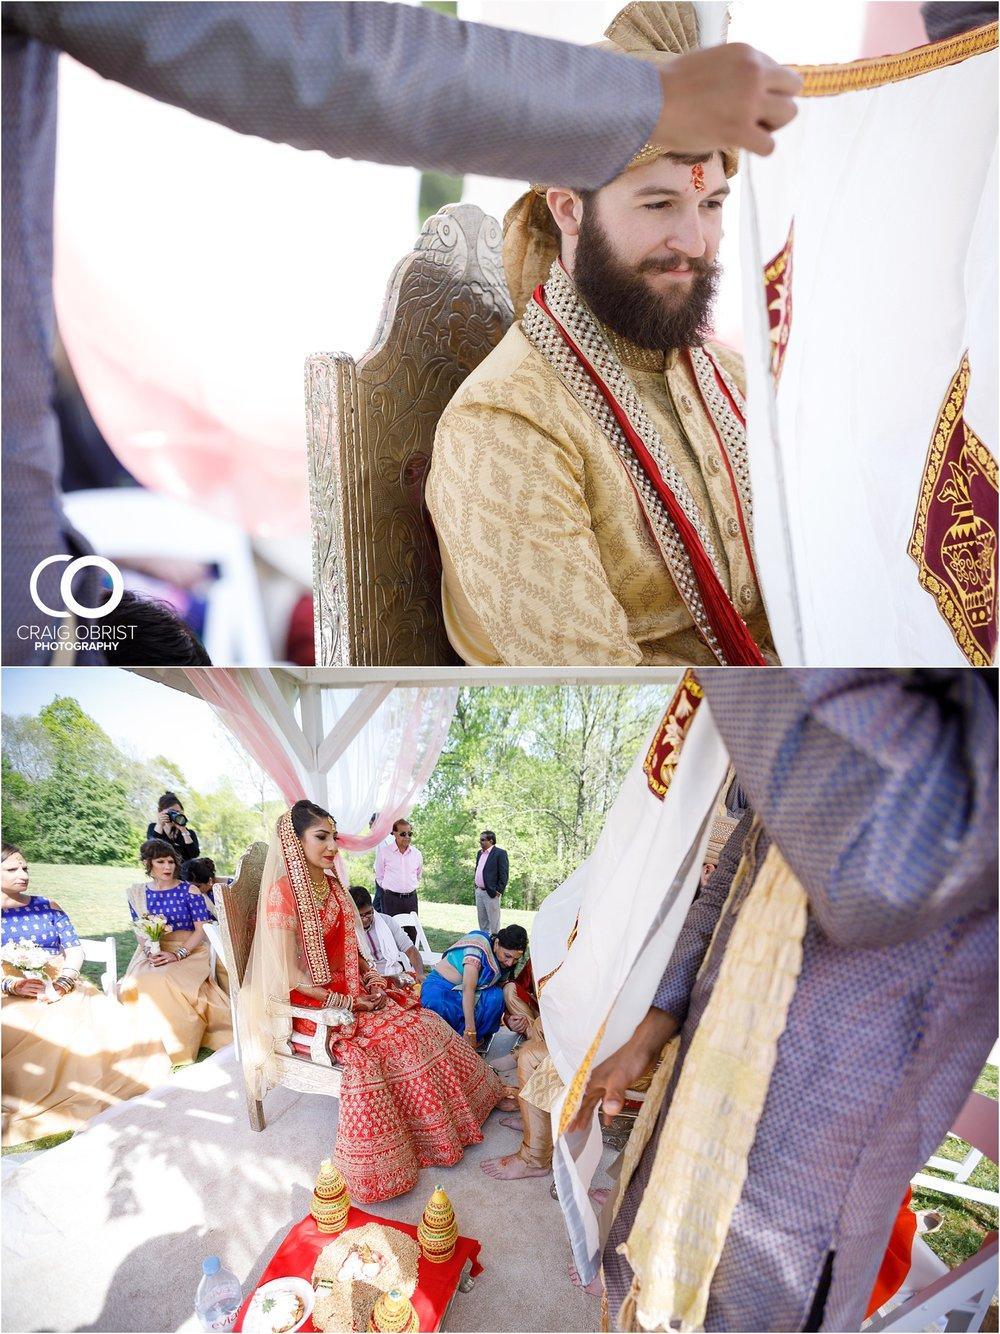 Chukkar Farm Polo Club Events & Weddings Craig Obrist_0077.jpg